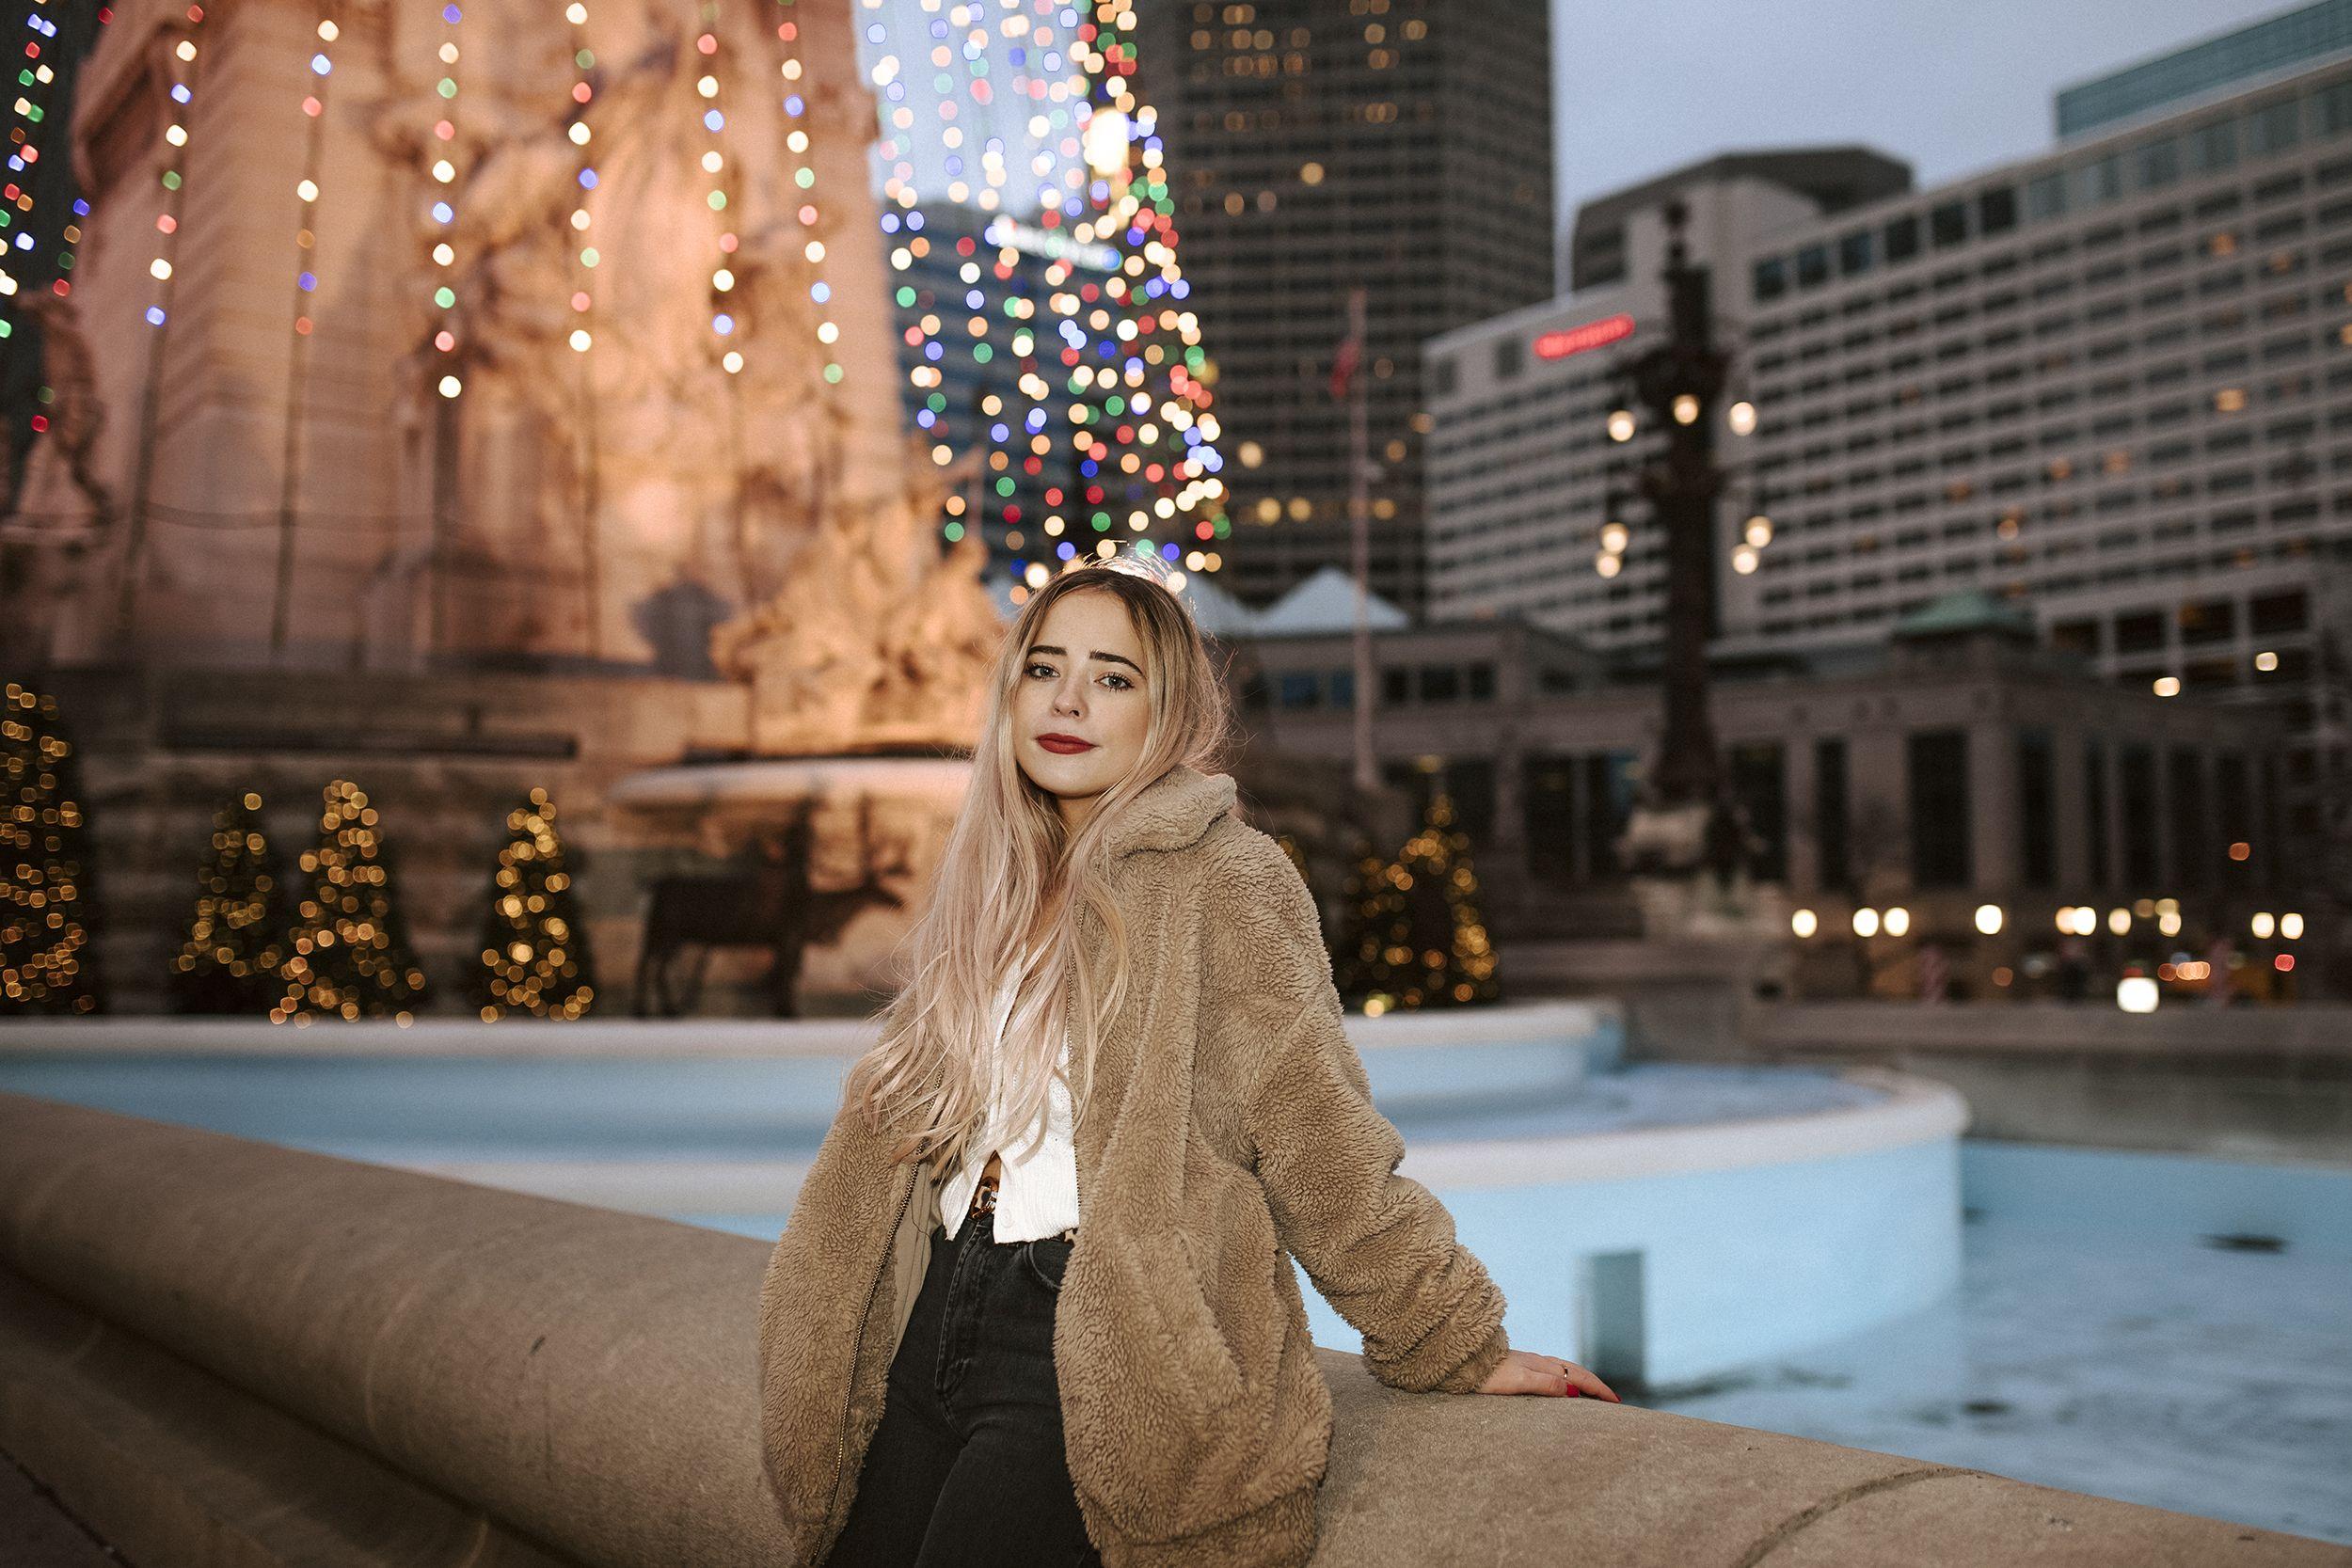 Fishers High School Christmas Break 2020 Pin on Senior Portraits // Caitlin Tyner Photography